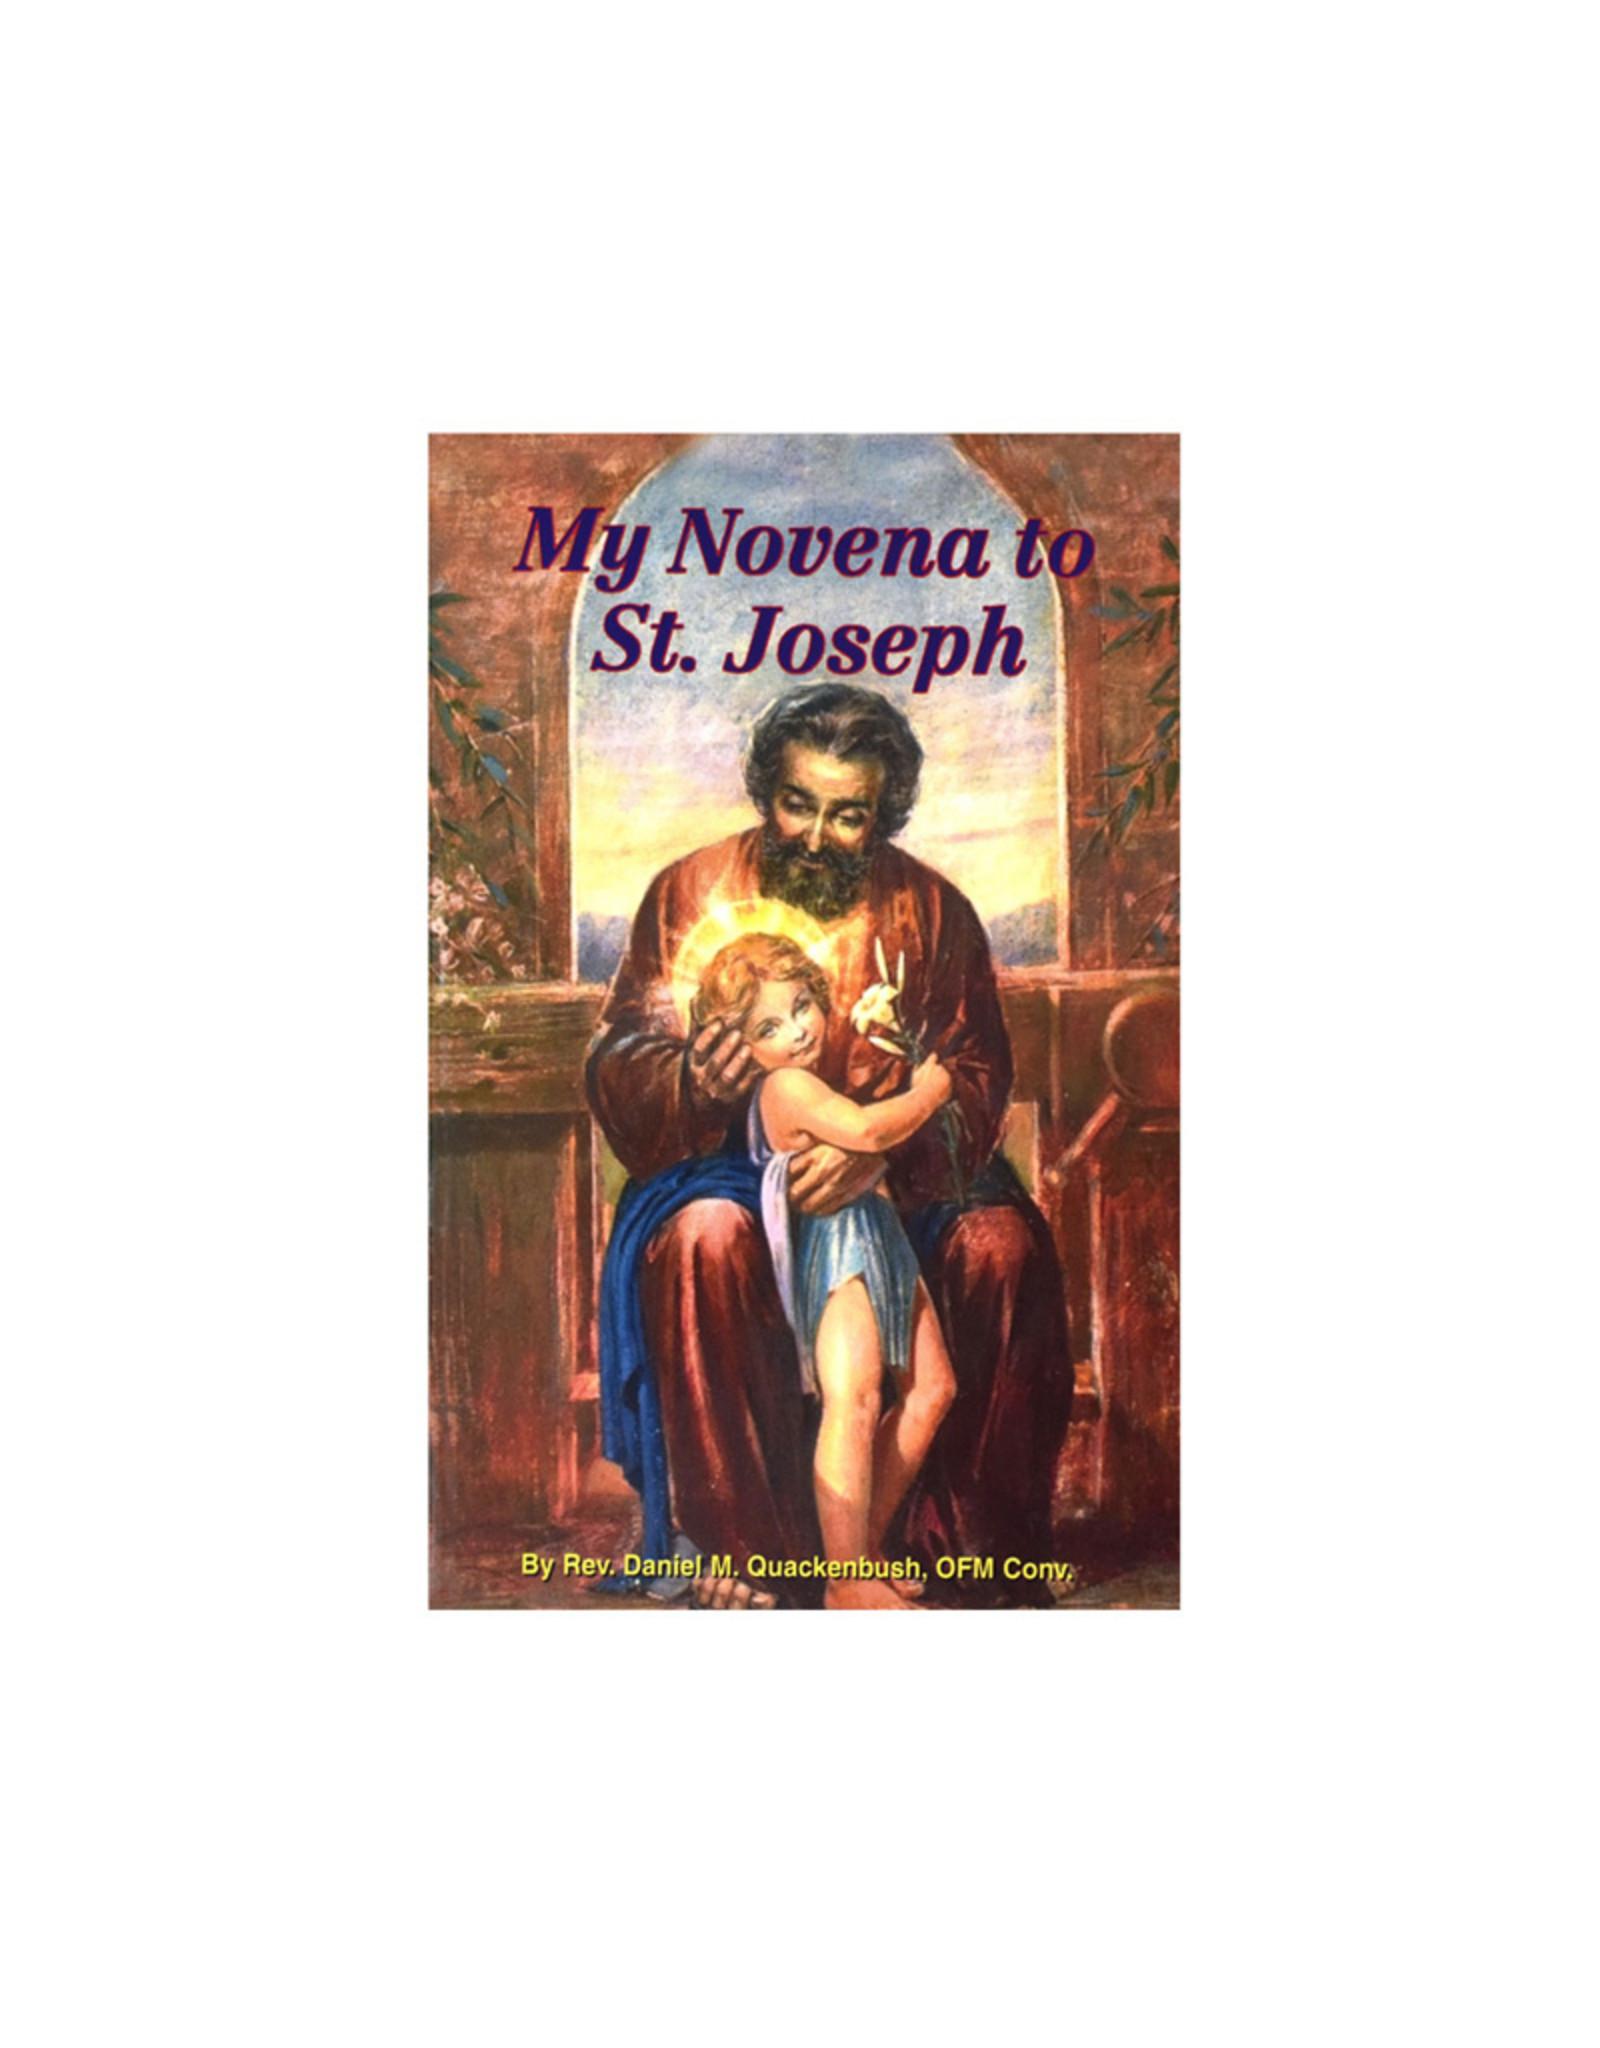 My Novena to St Joseph